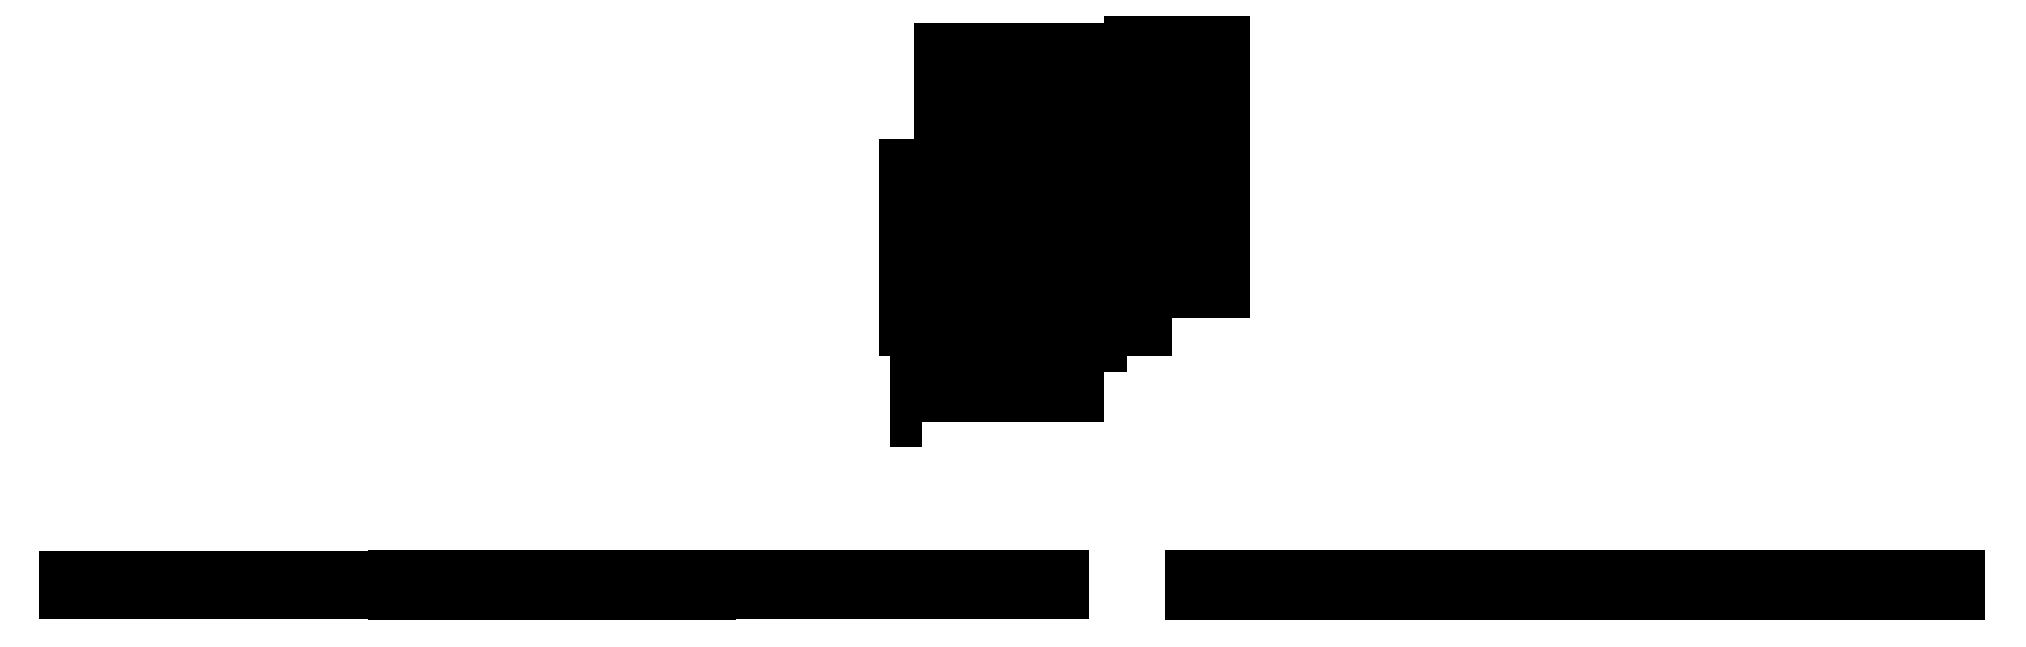 TTDF-LOGO-w-initial.png